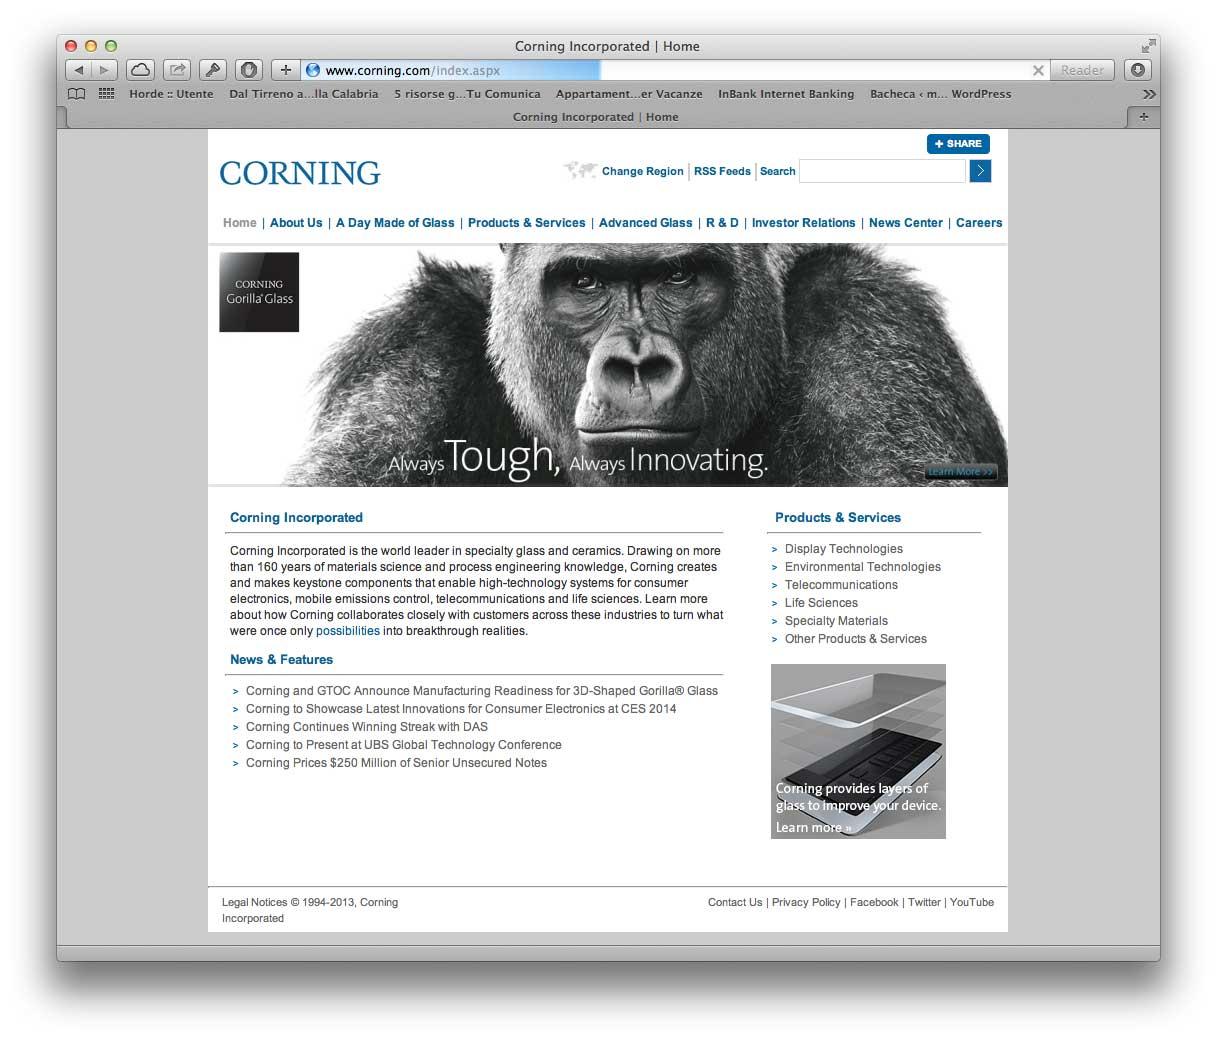 Sito web Corning